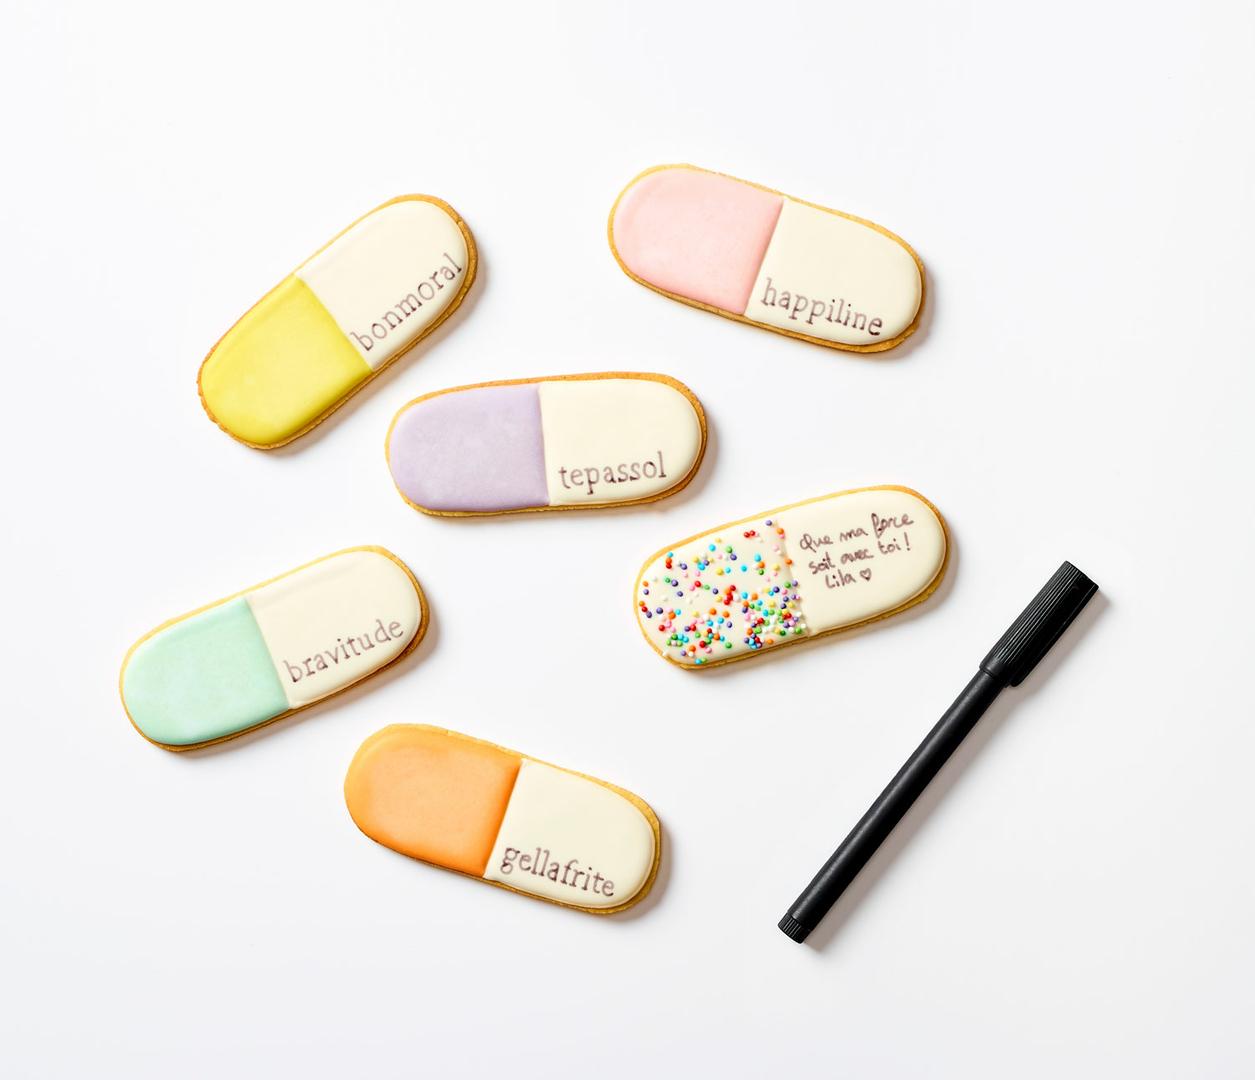 biscuits-croque-la-vie-malade